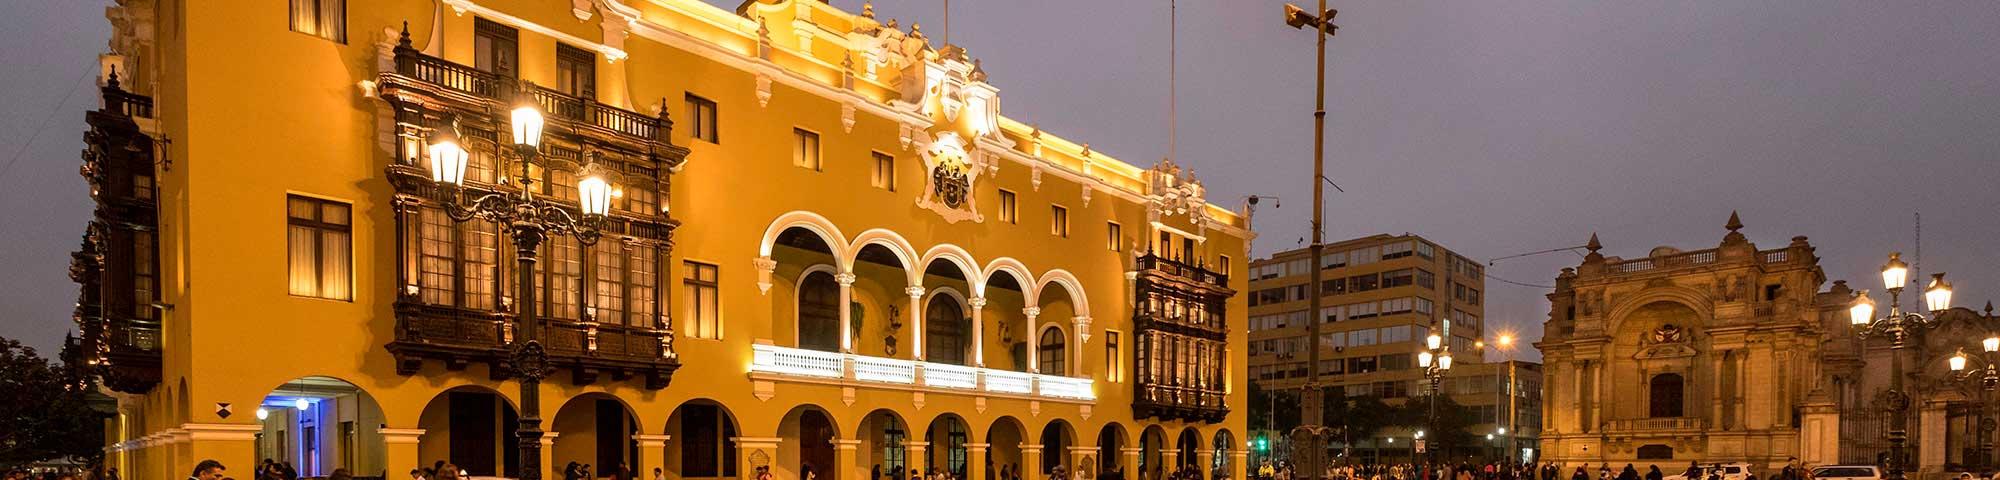 Palacio Municipal de Lima: Se reanudan recorridos turísticos